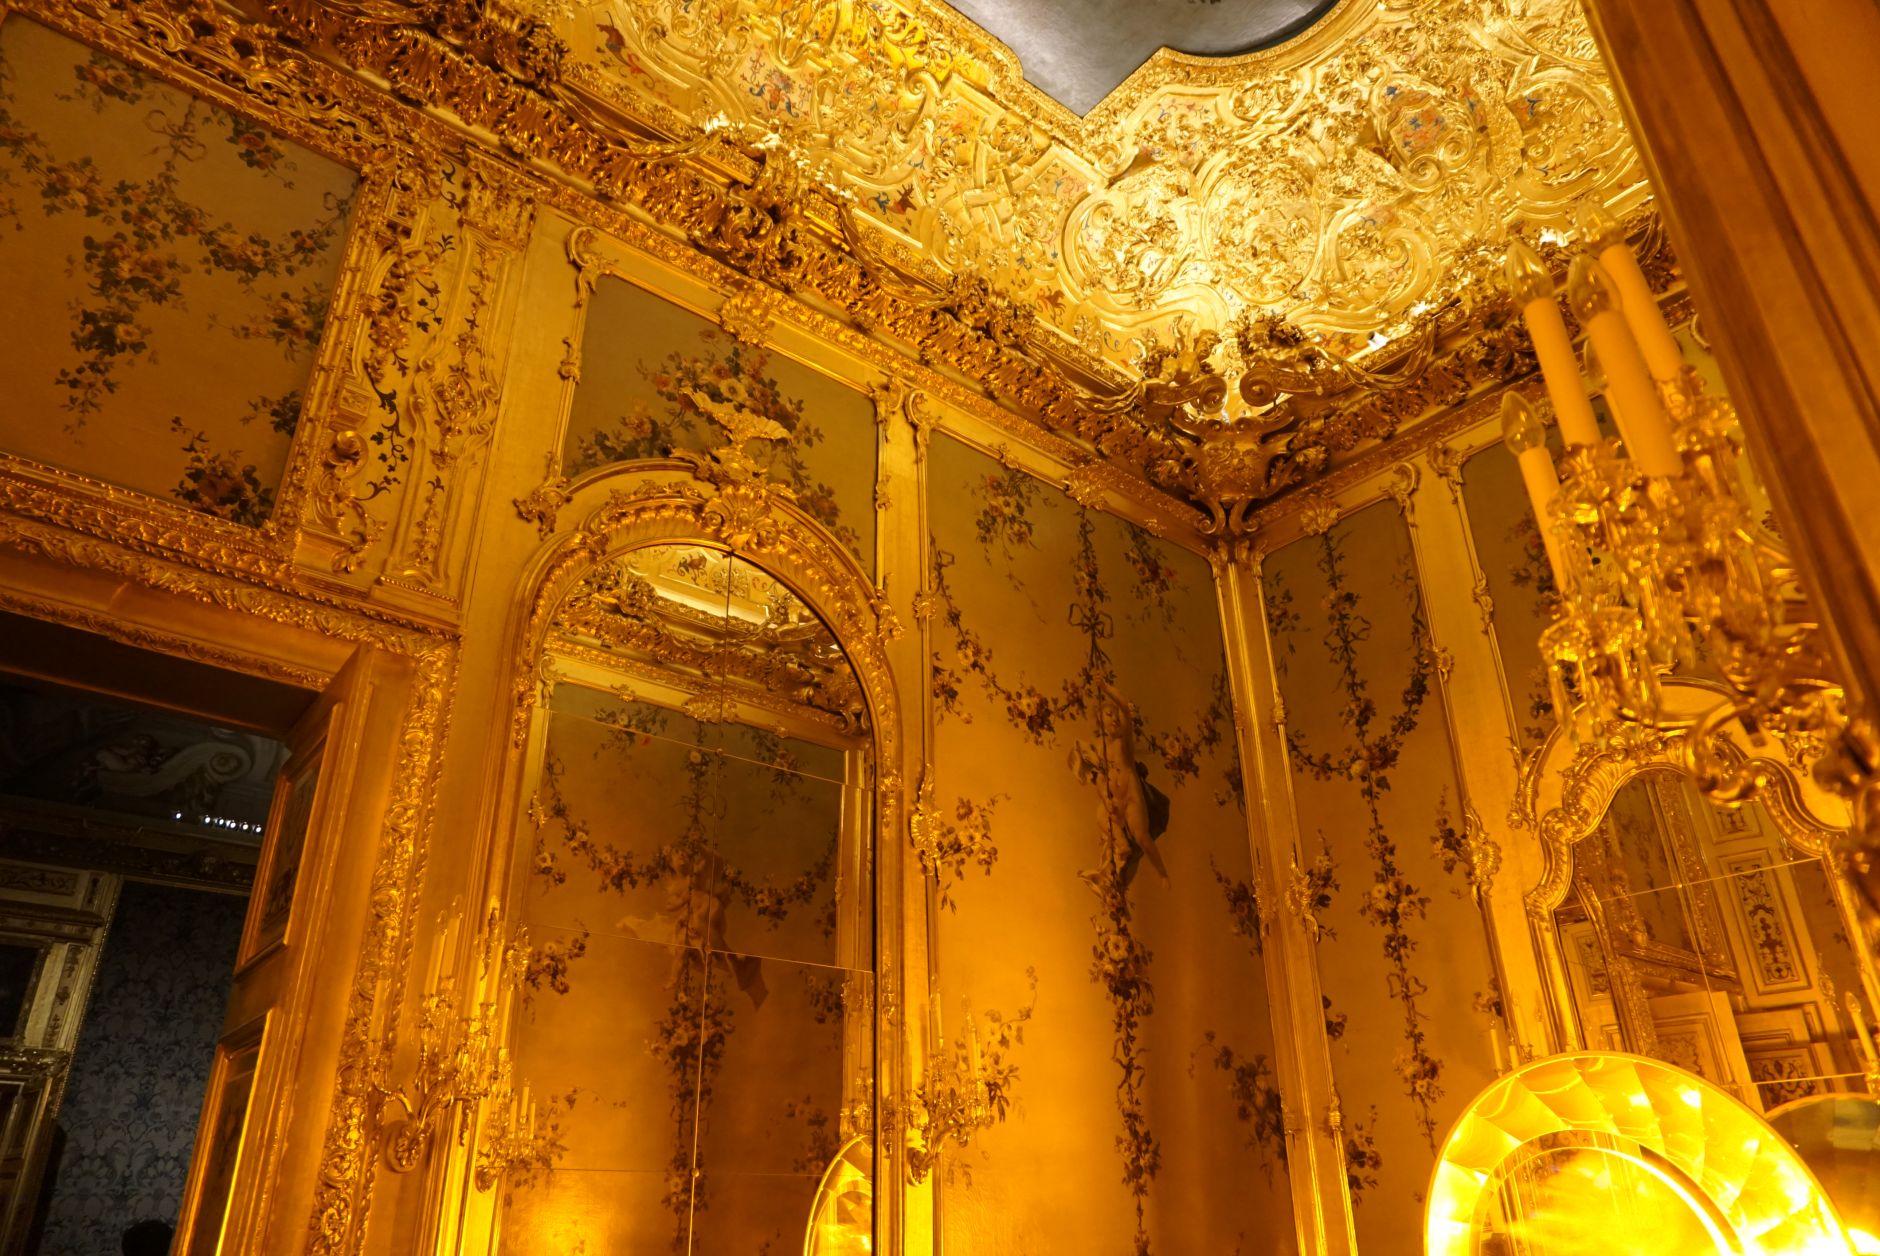 dc-art-olafur-eliasson-baroque-baroque-the-winter-palace-of-prince-eugene-of-savoy-vienna-14